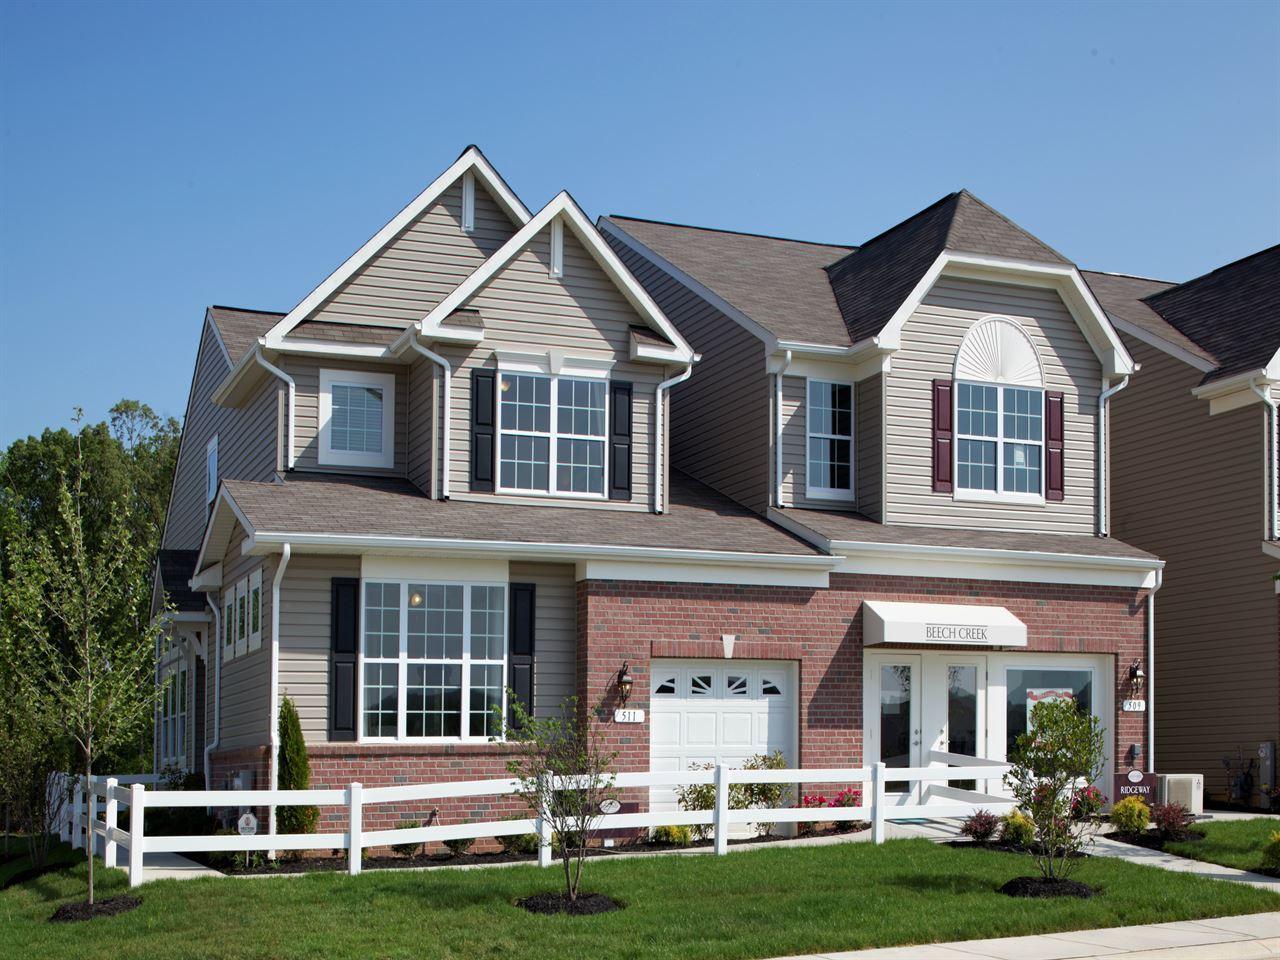 Ryland homes beech creek 2 car garage villas ridgeway for Ryland homes